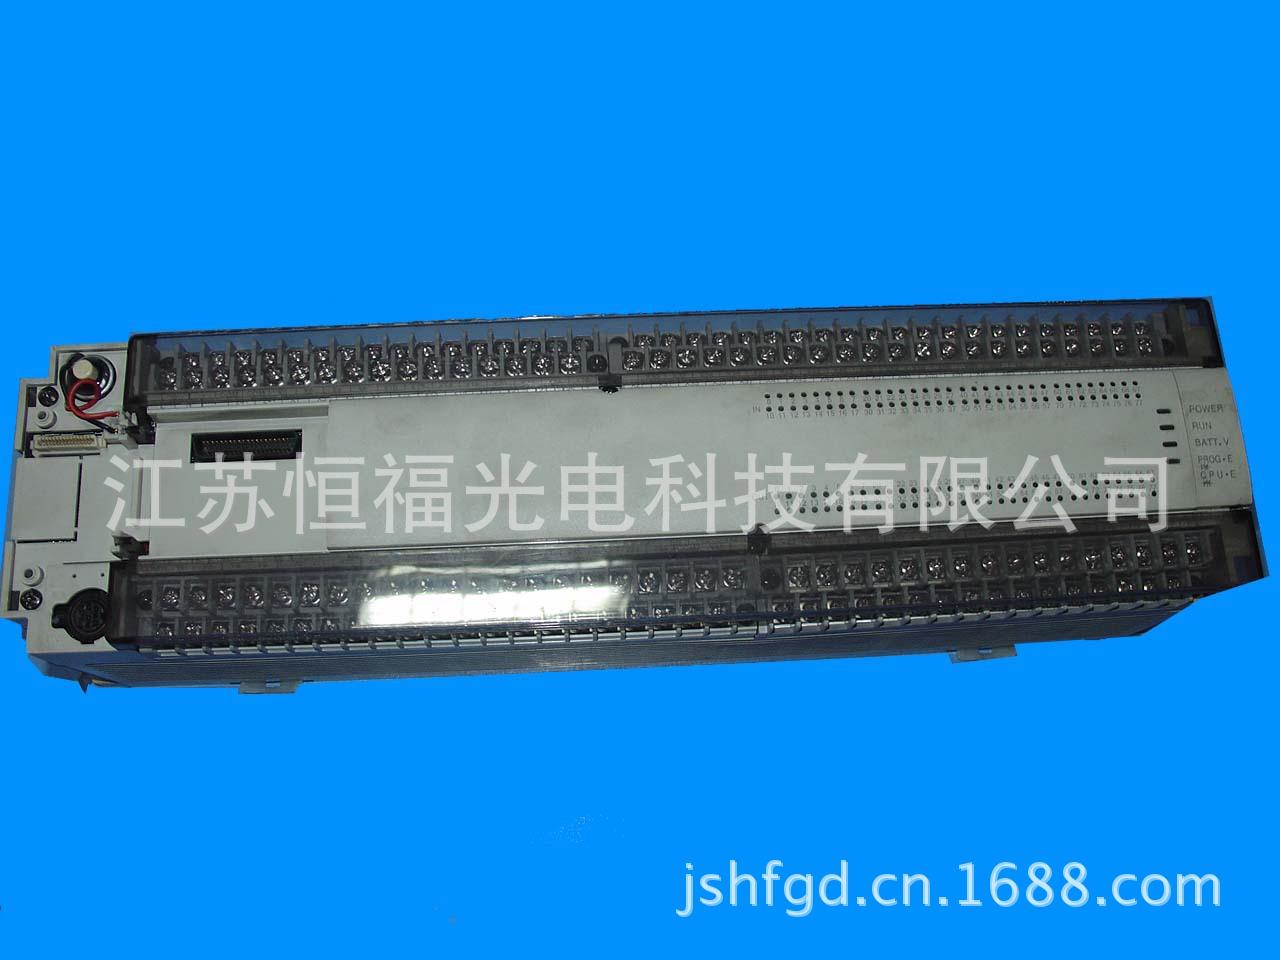 plc16f716混频电路图